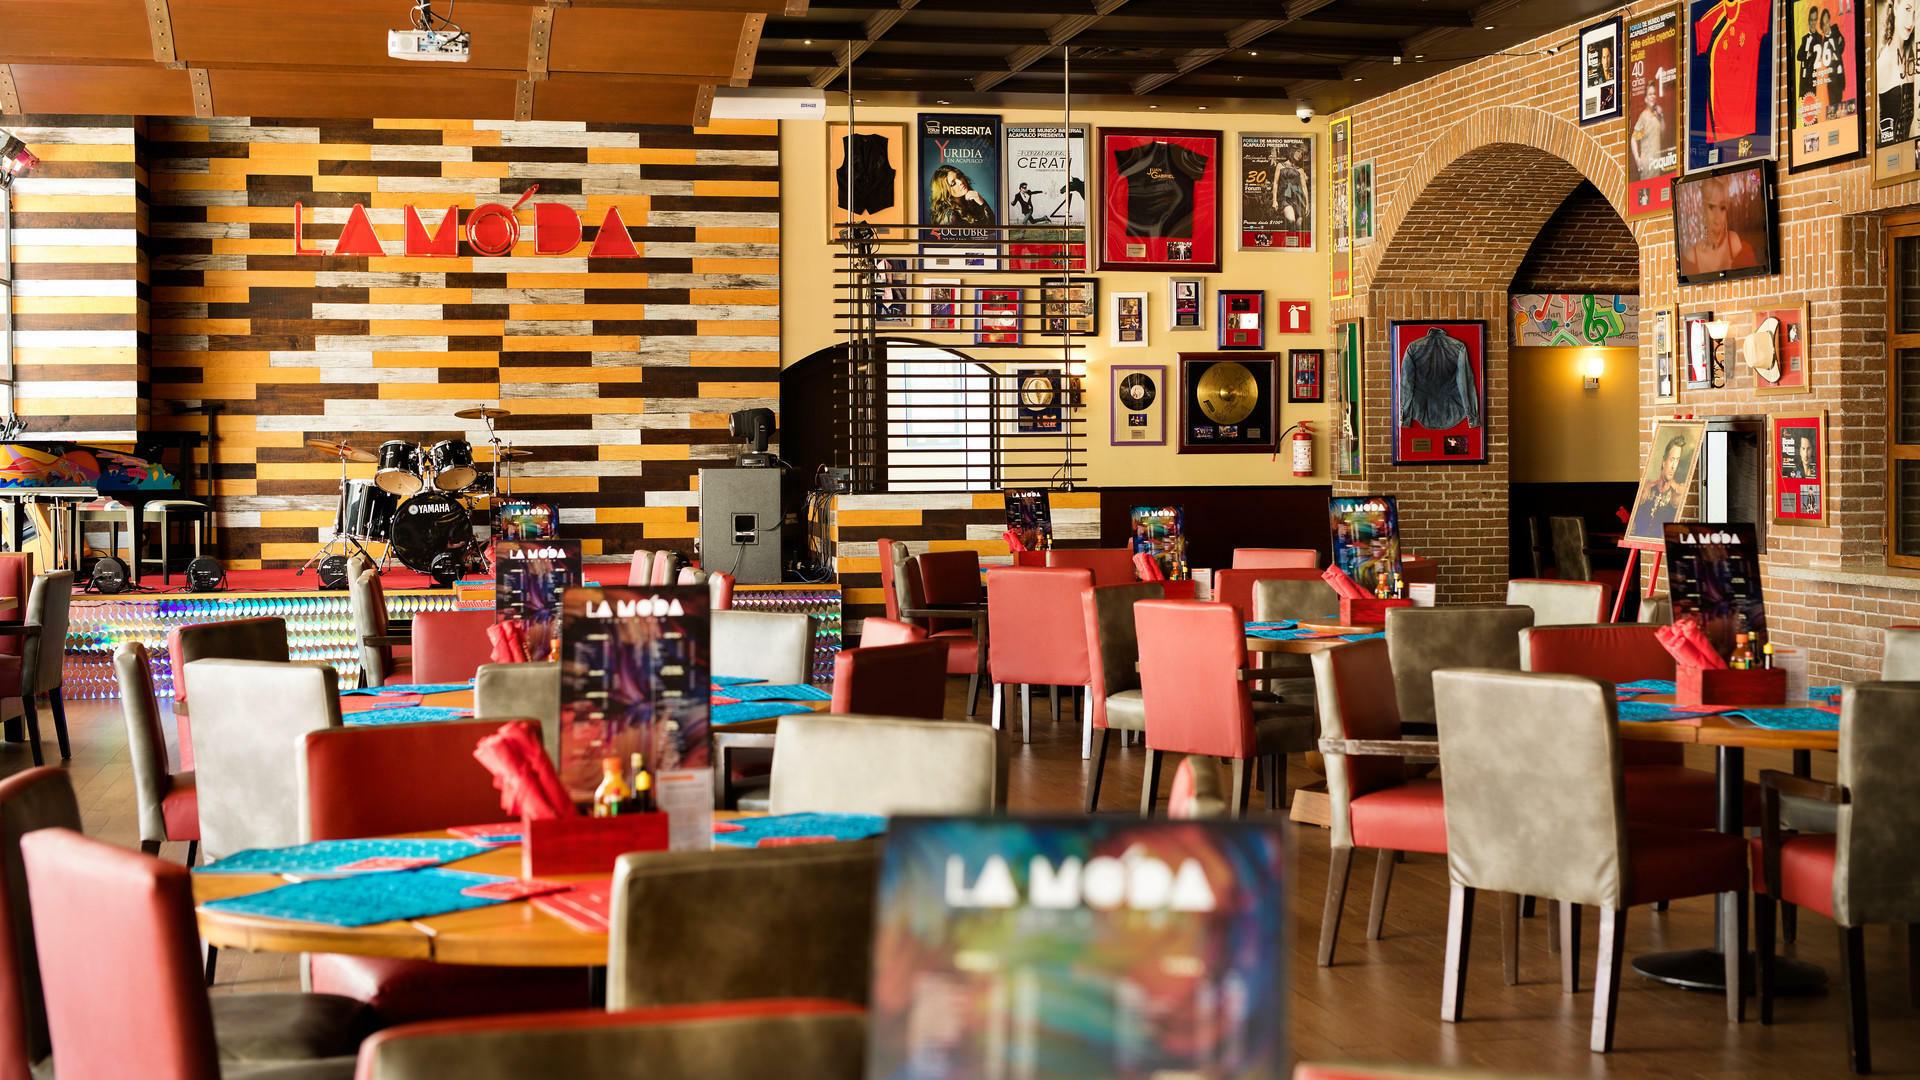 Dining area at La Moda Restaurant in Mundo Imperial